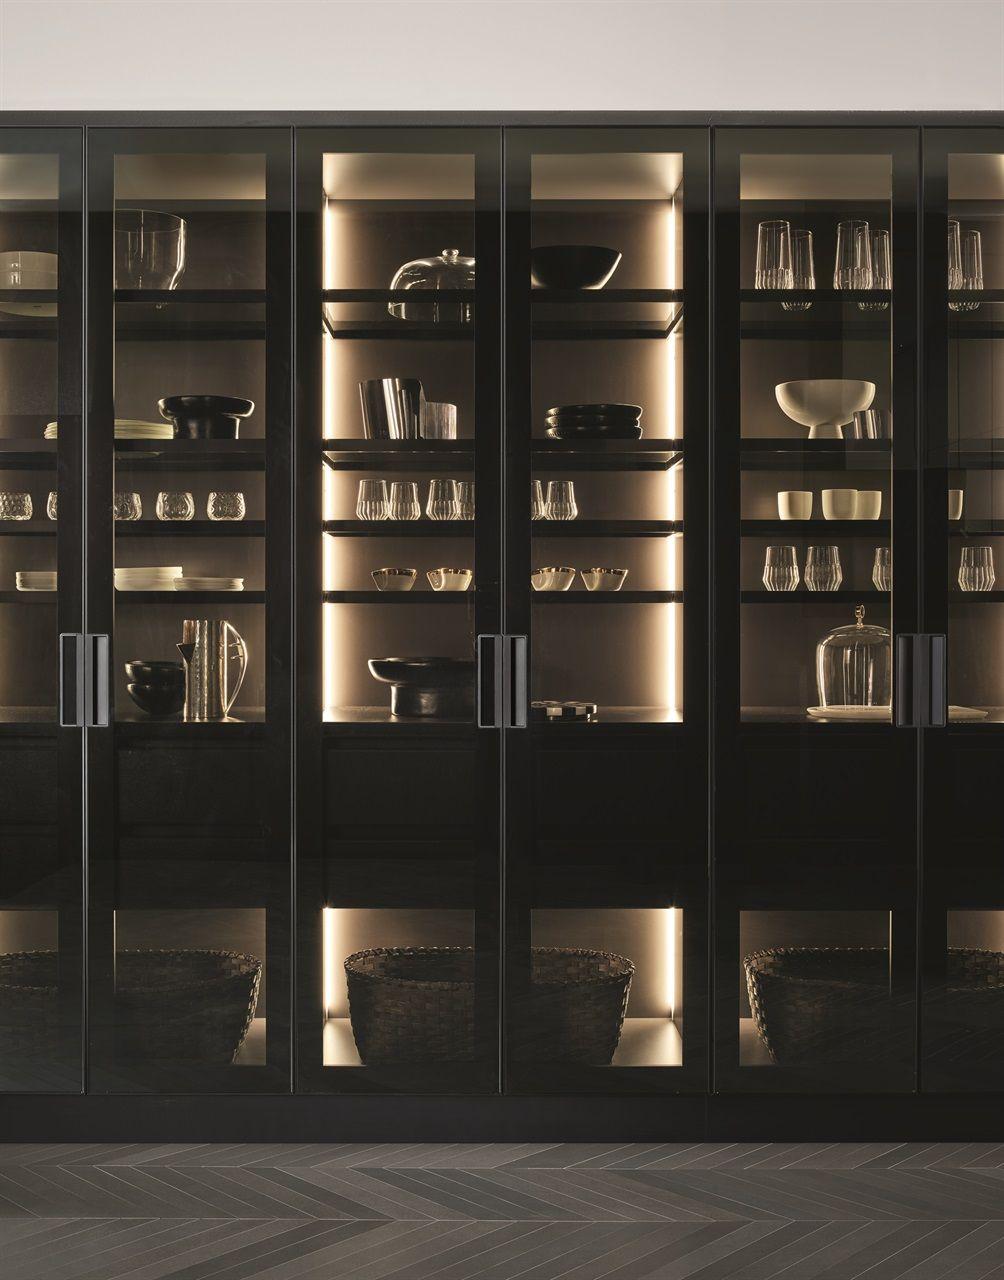 Poliform A Modern Kitchen Tale Crockery Cabinet Design Modern Kitchen Design Home Bar Designs